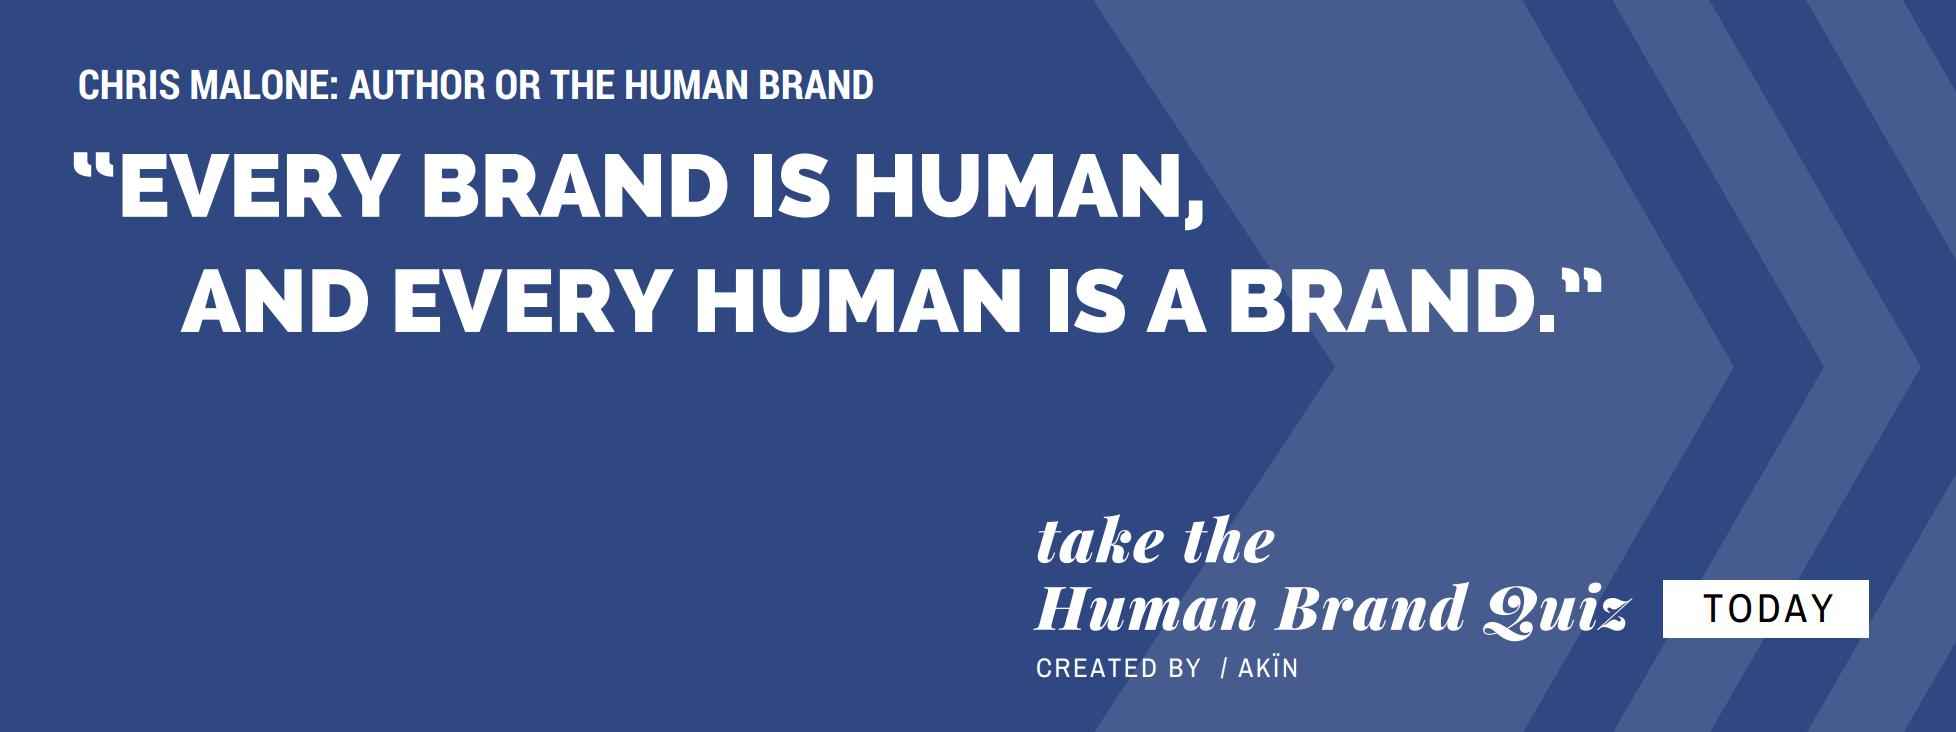 humanbrandquiz_Blue